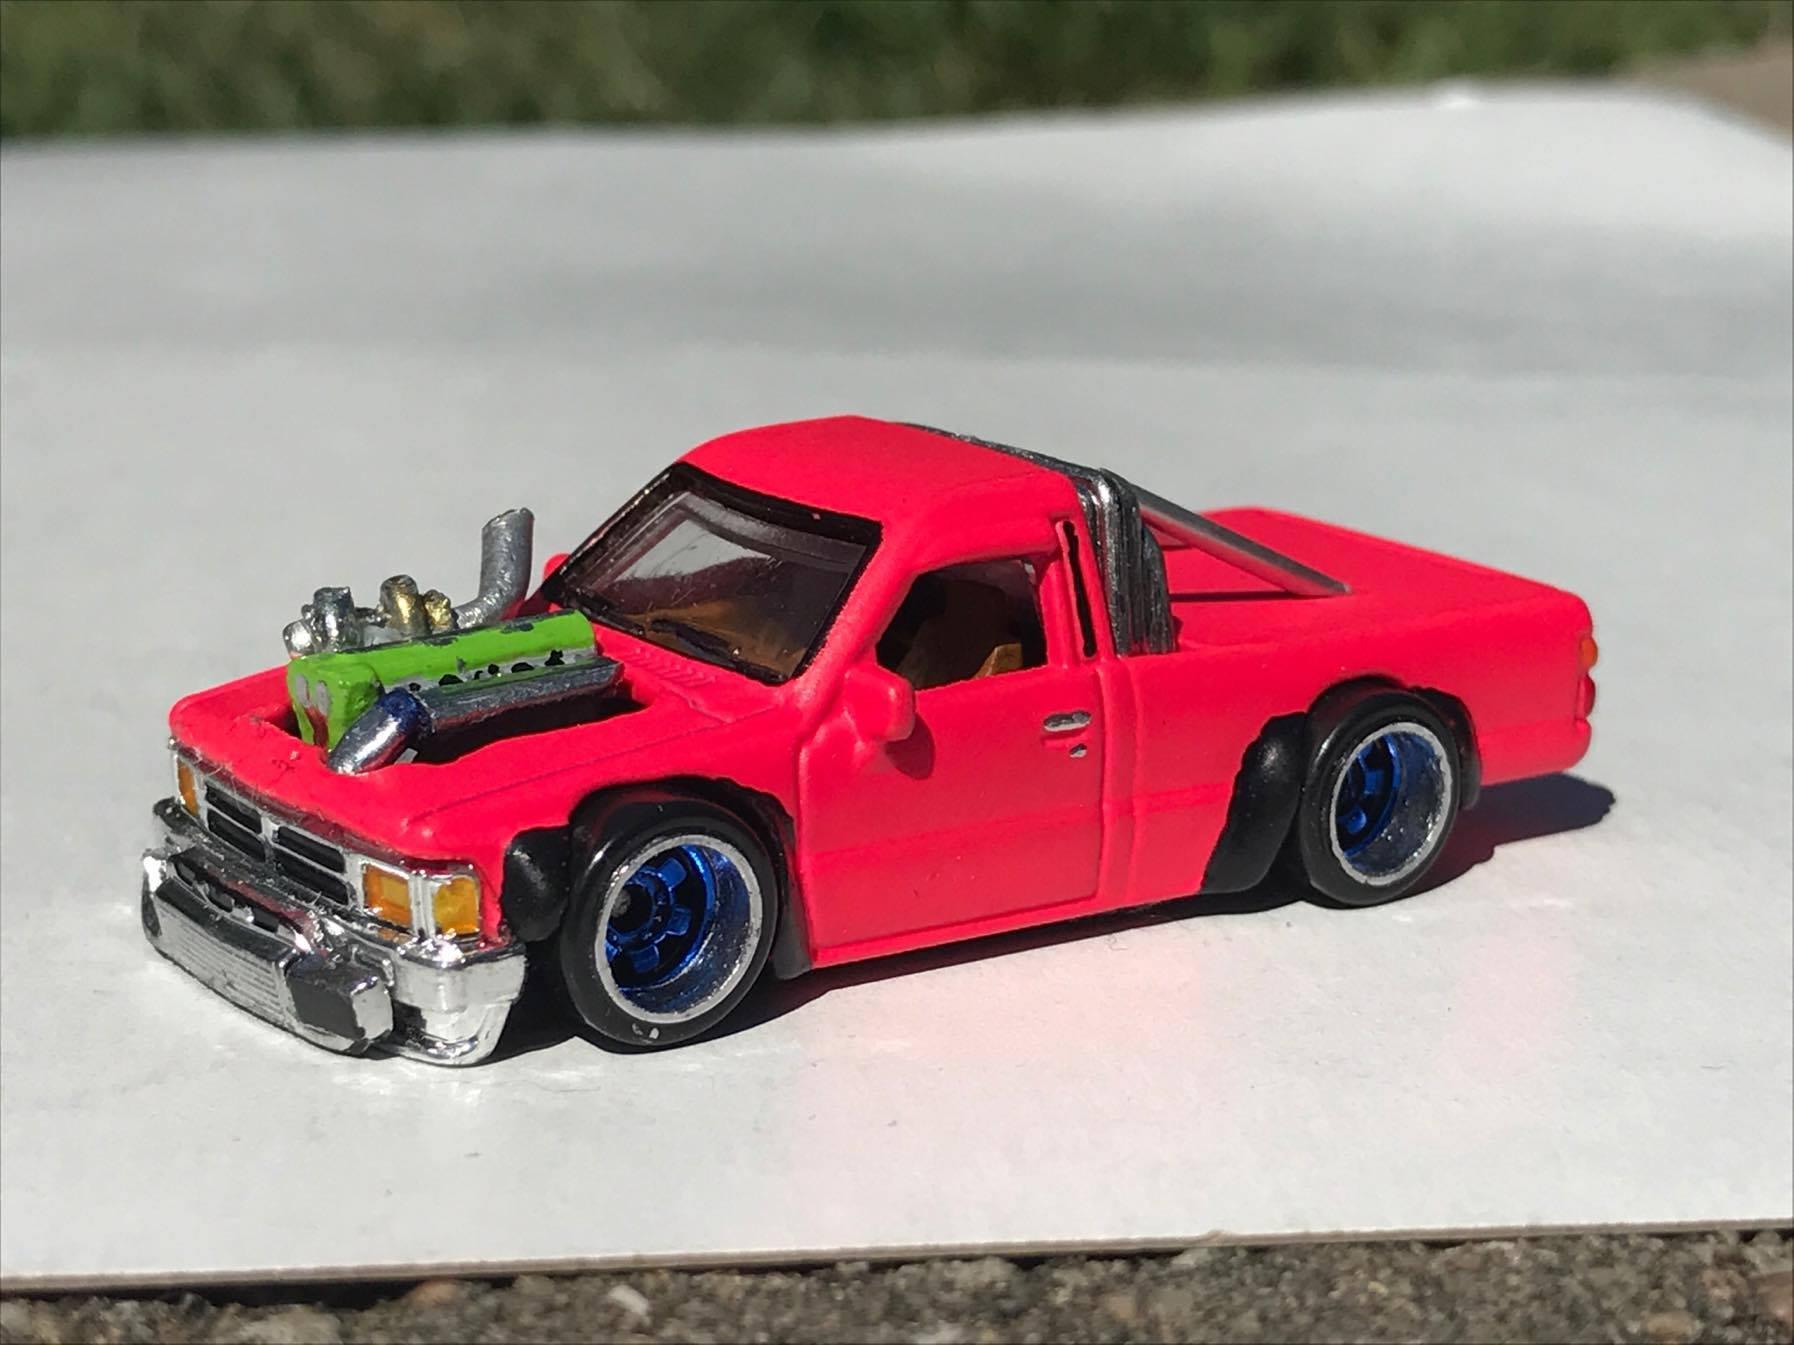 Ass in the steering wheel - 3 1